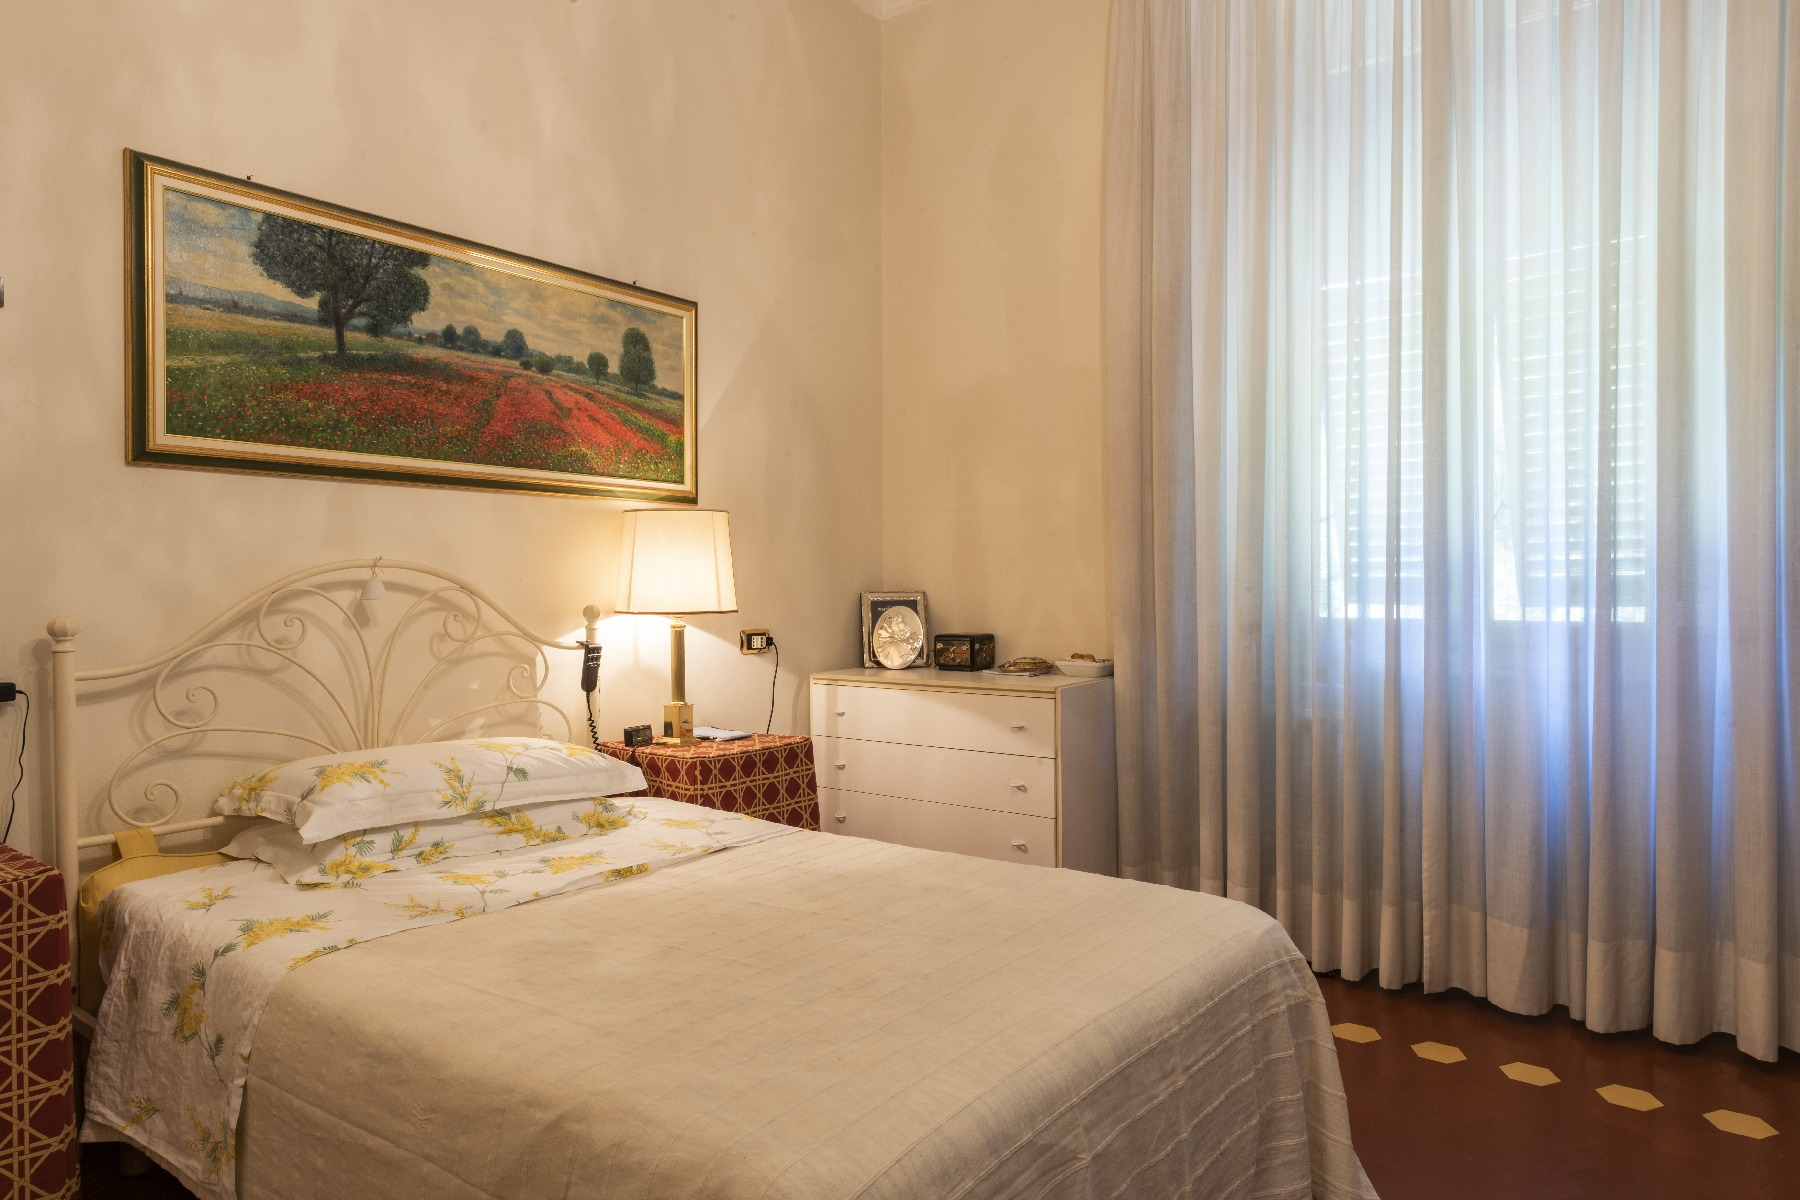 Villa in Vendita a Lucca: 5 locali, 660 mq - Foto 16